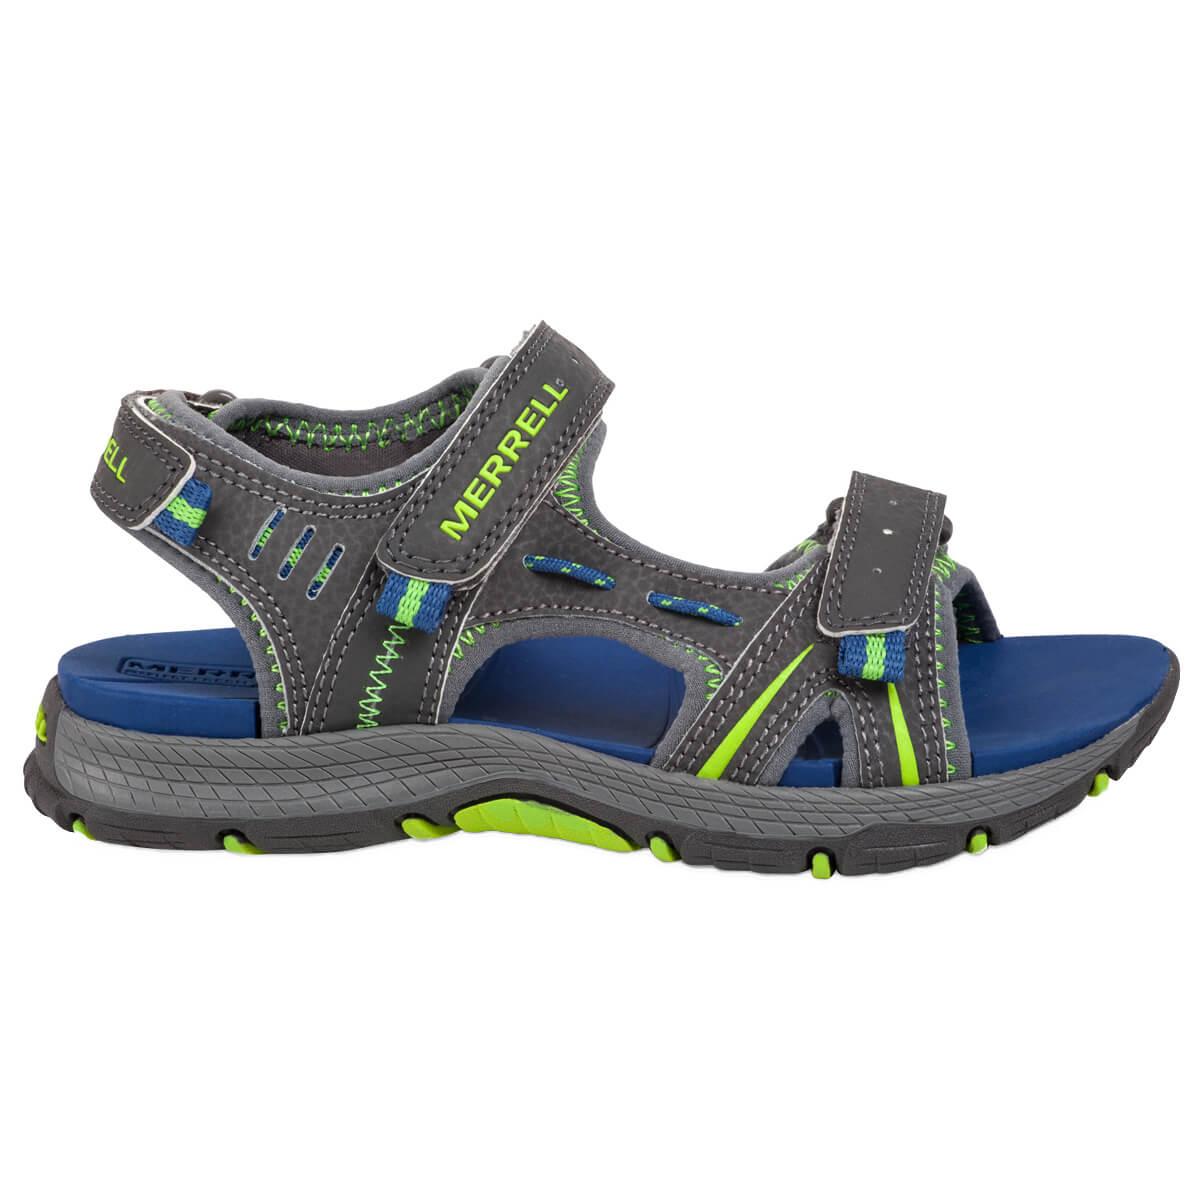 Buy Merrell Shoes Canada